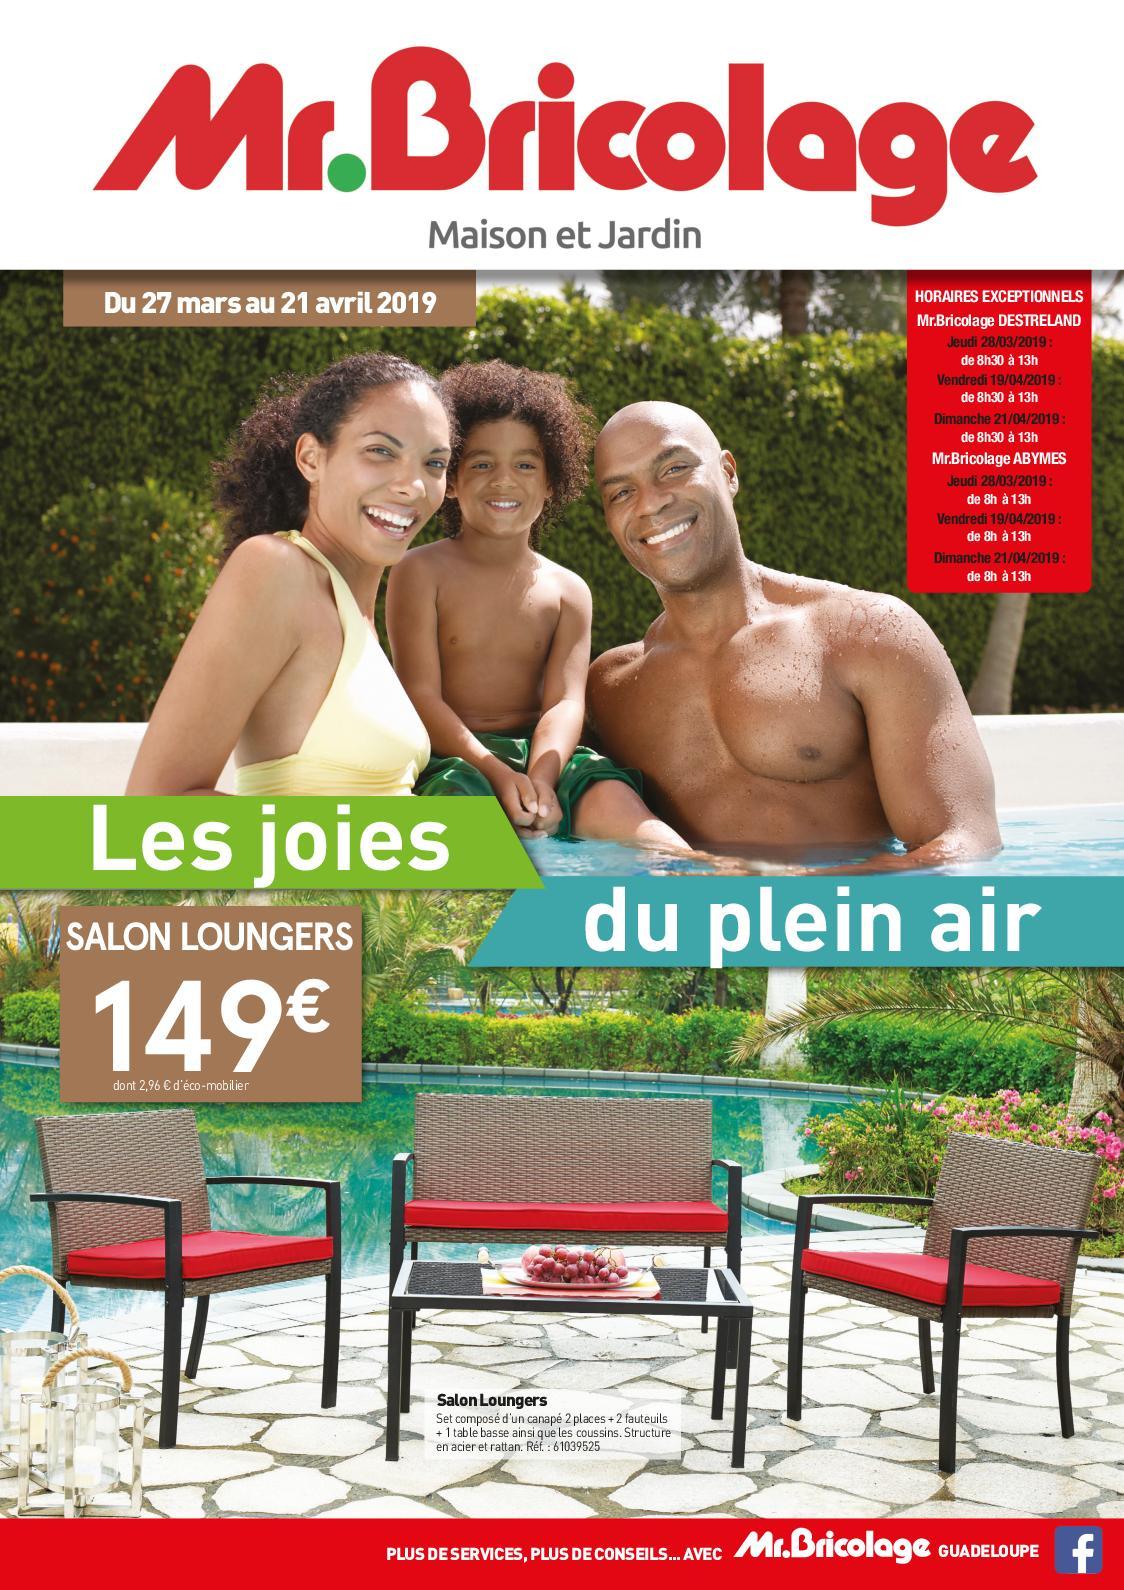 Calaméo - Mr Bricolage Guadeloupe - Catalogue Plein Air 2019 à Salon De Jardin Mr Bricolage